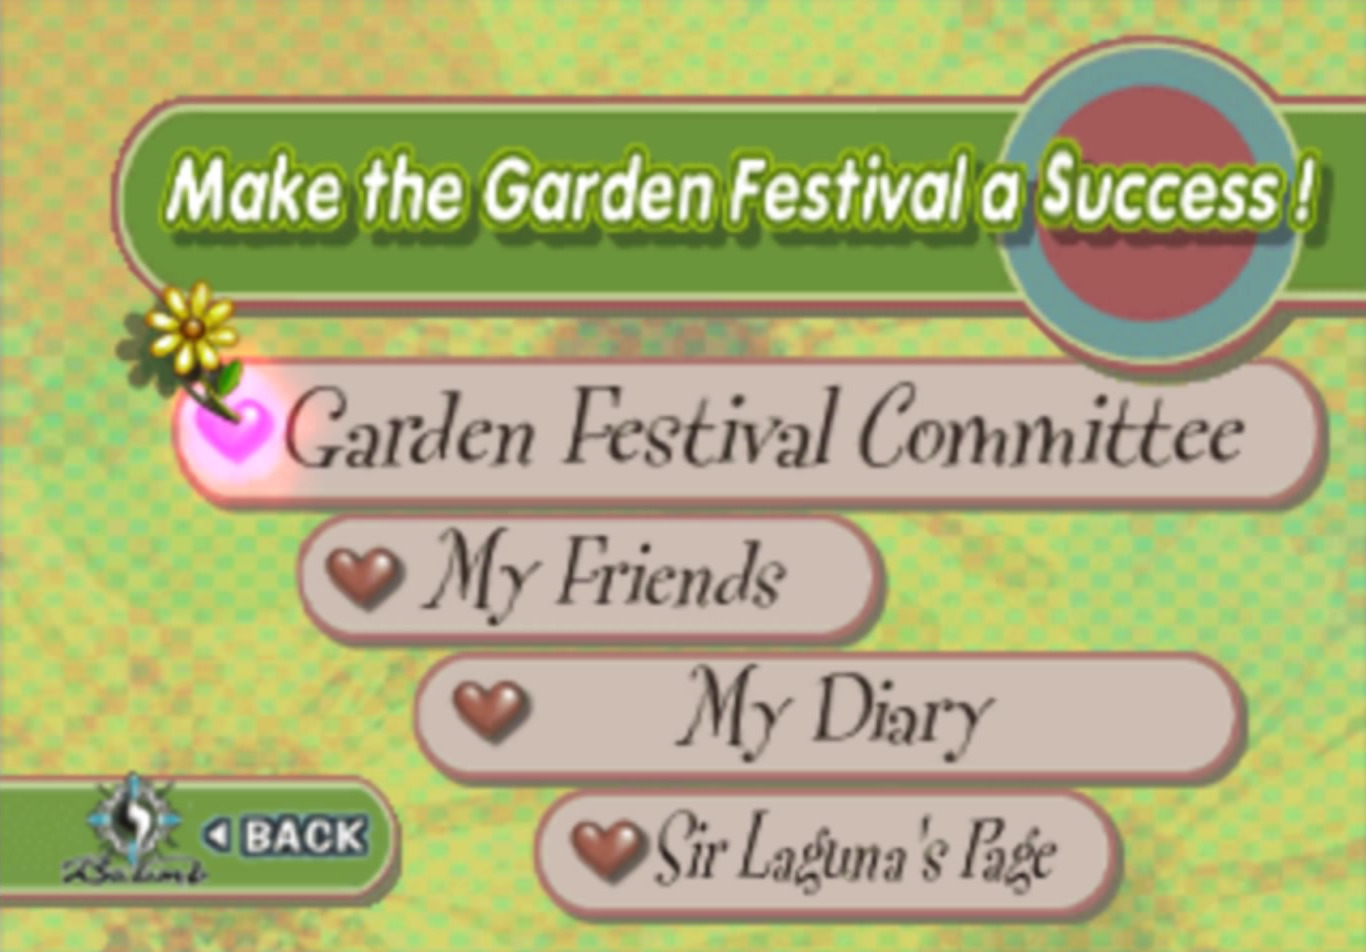 File:Festival Commitee Screen.jpg